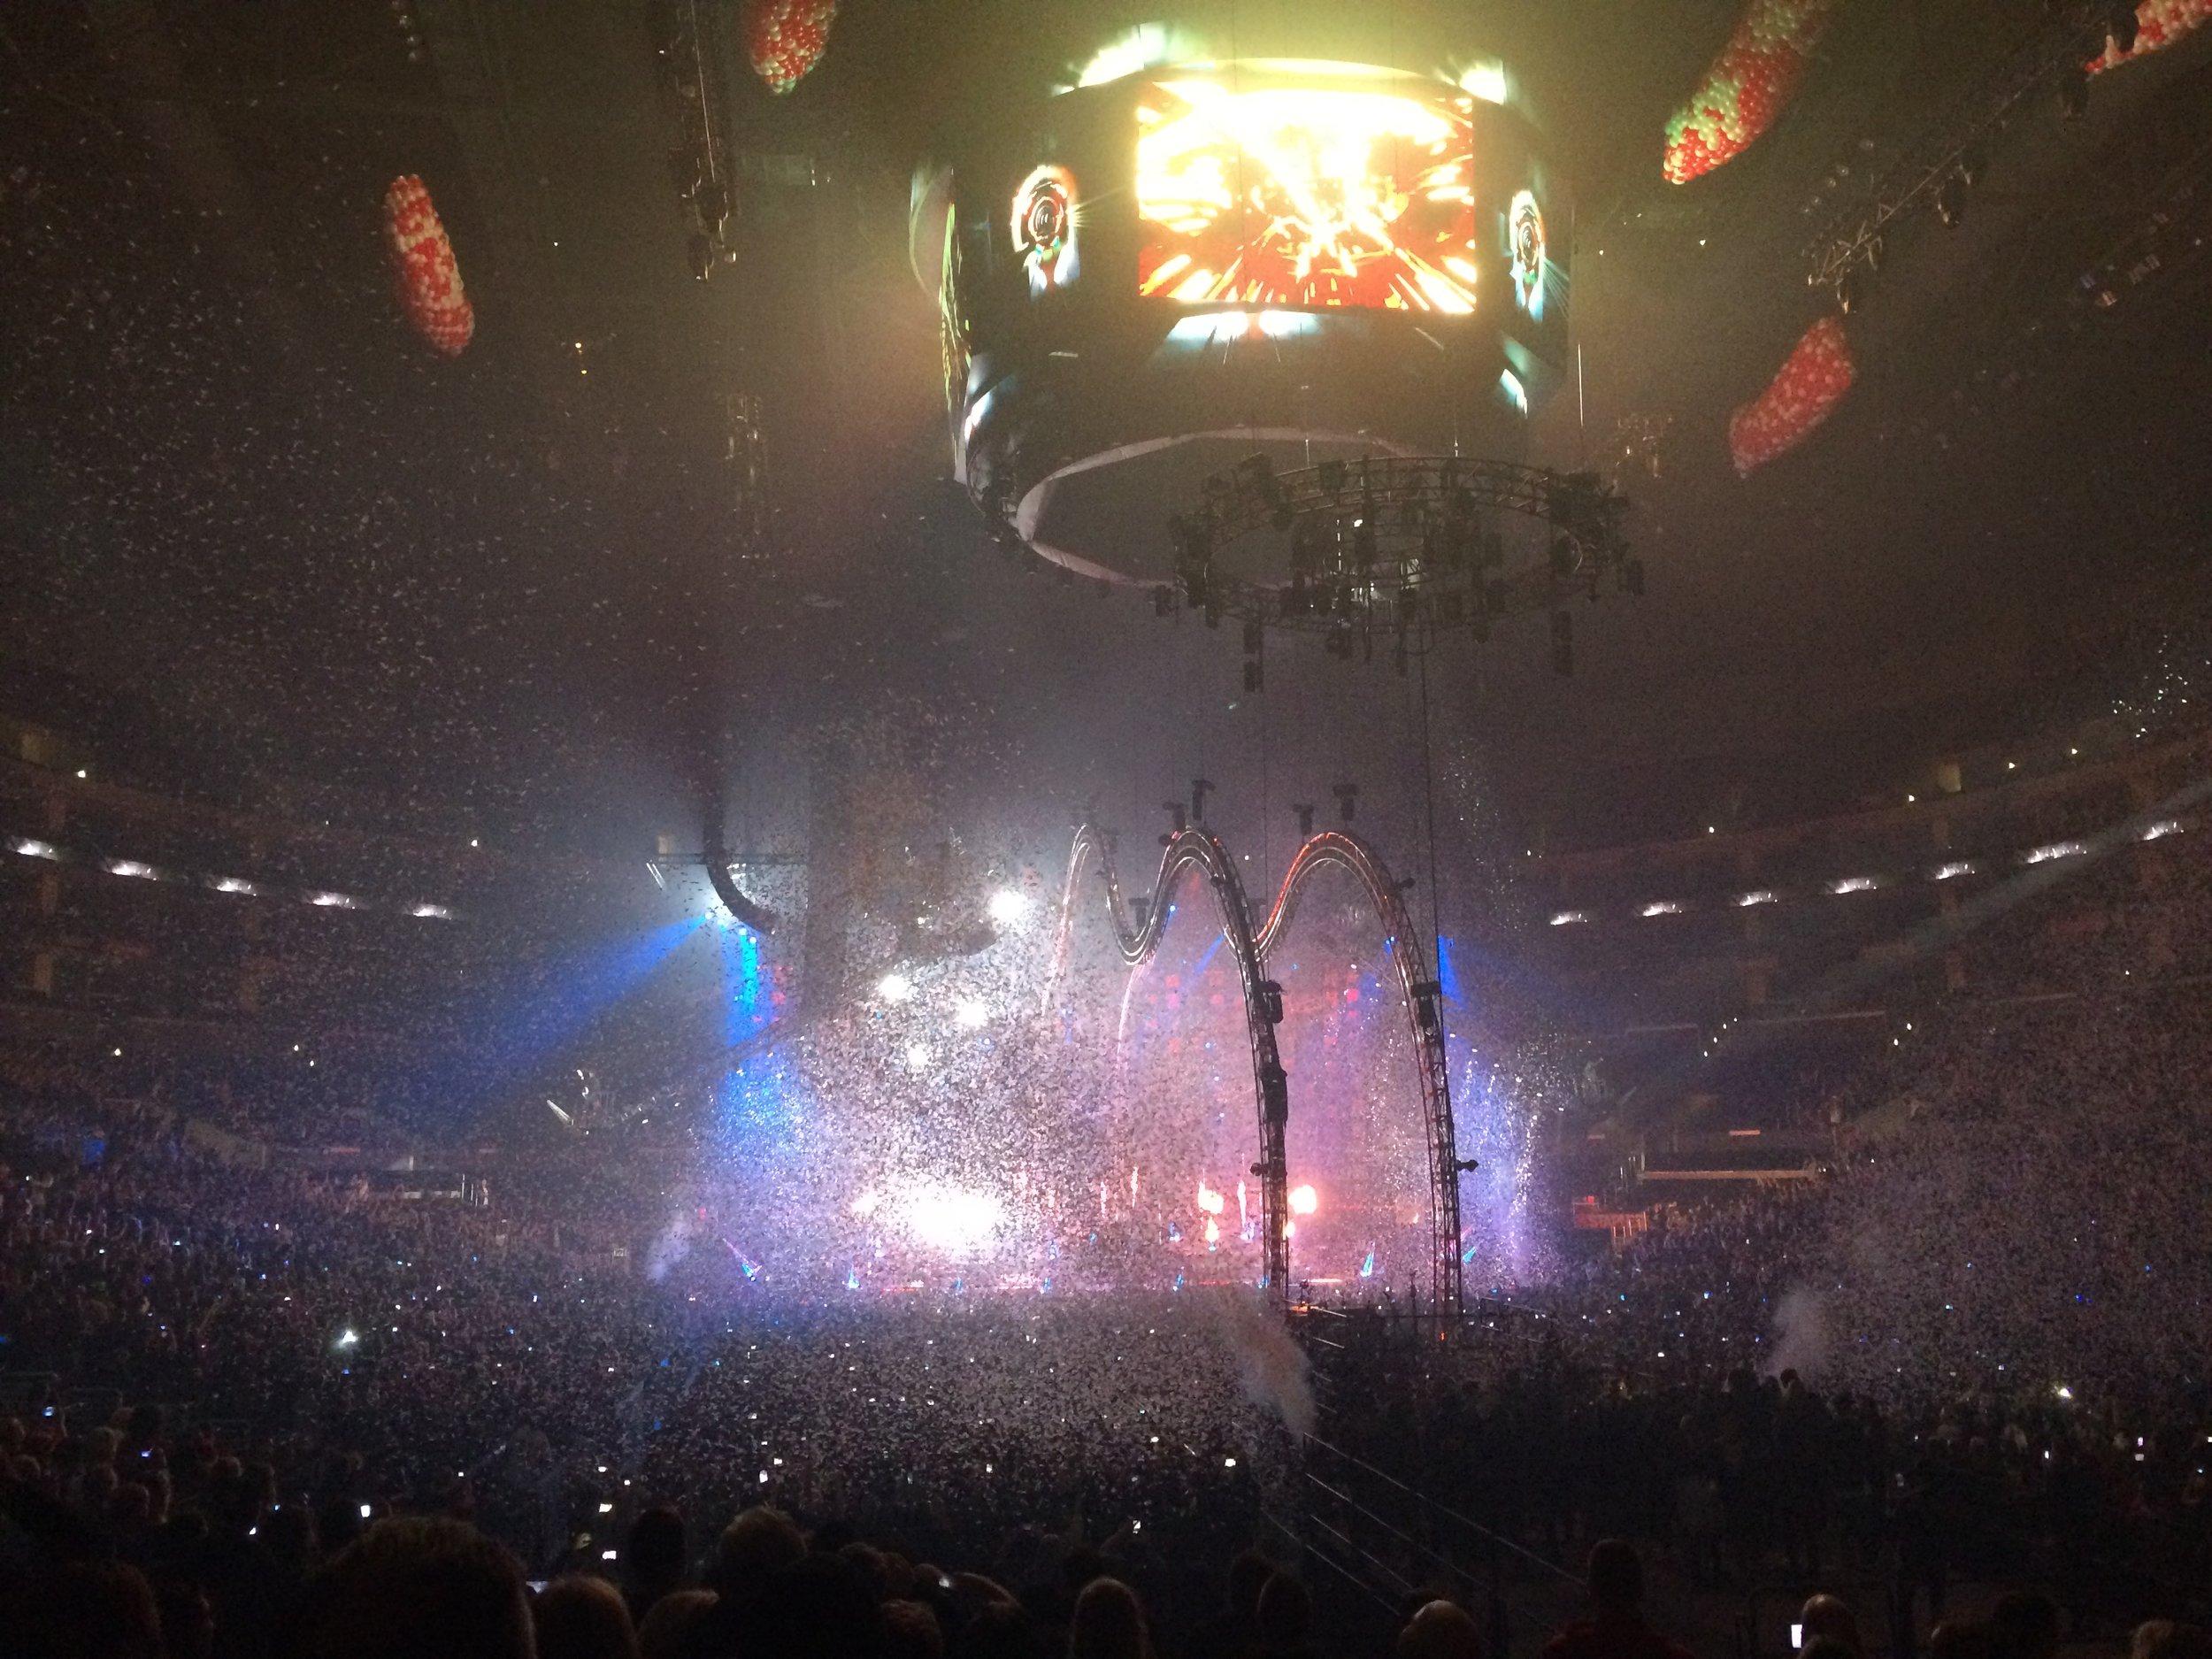 Mötley Crül at the Staples Center